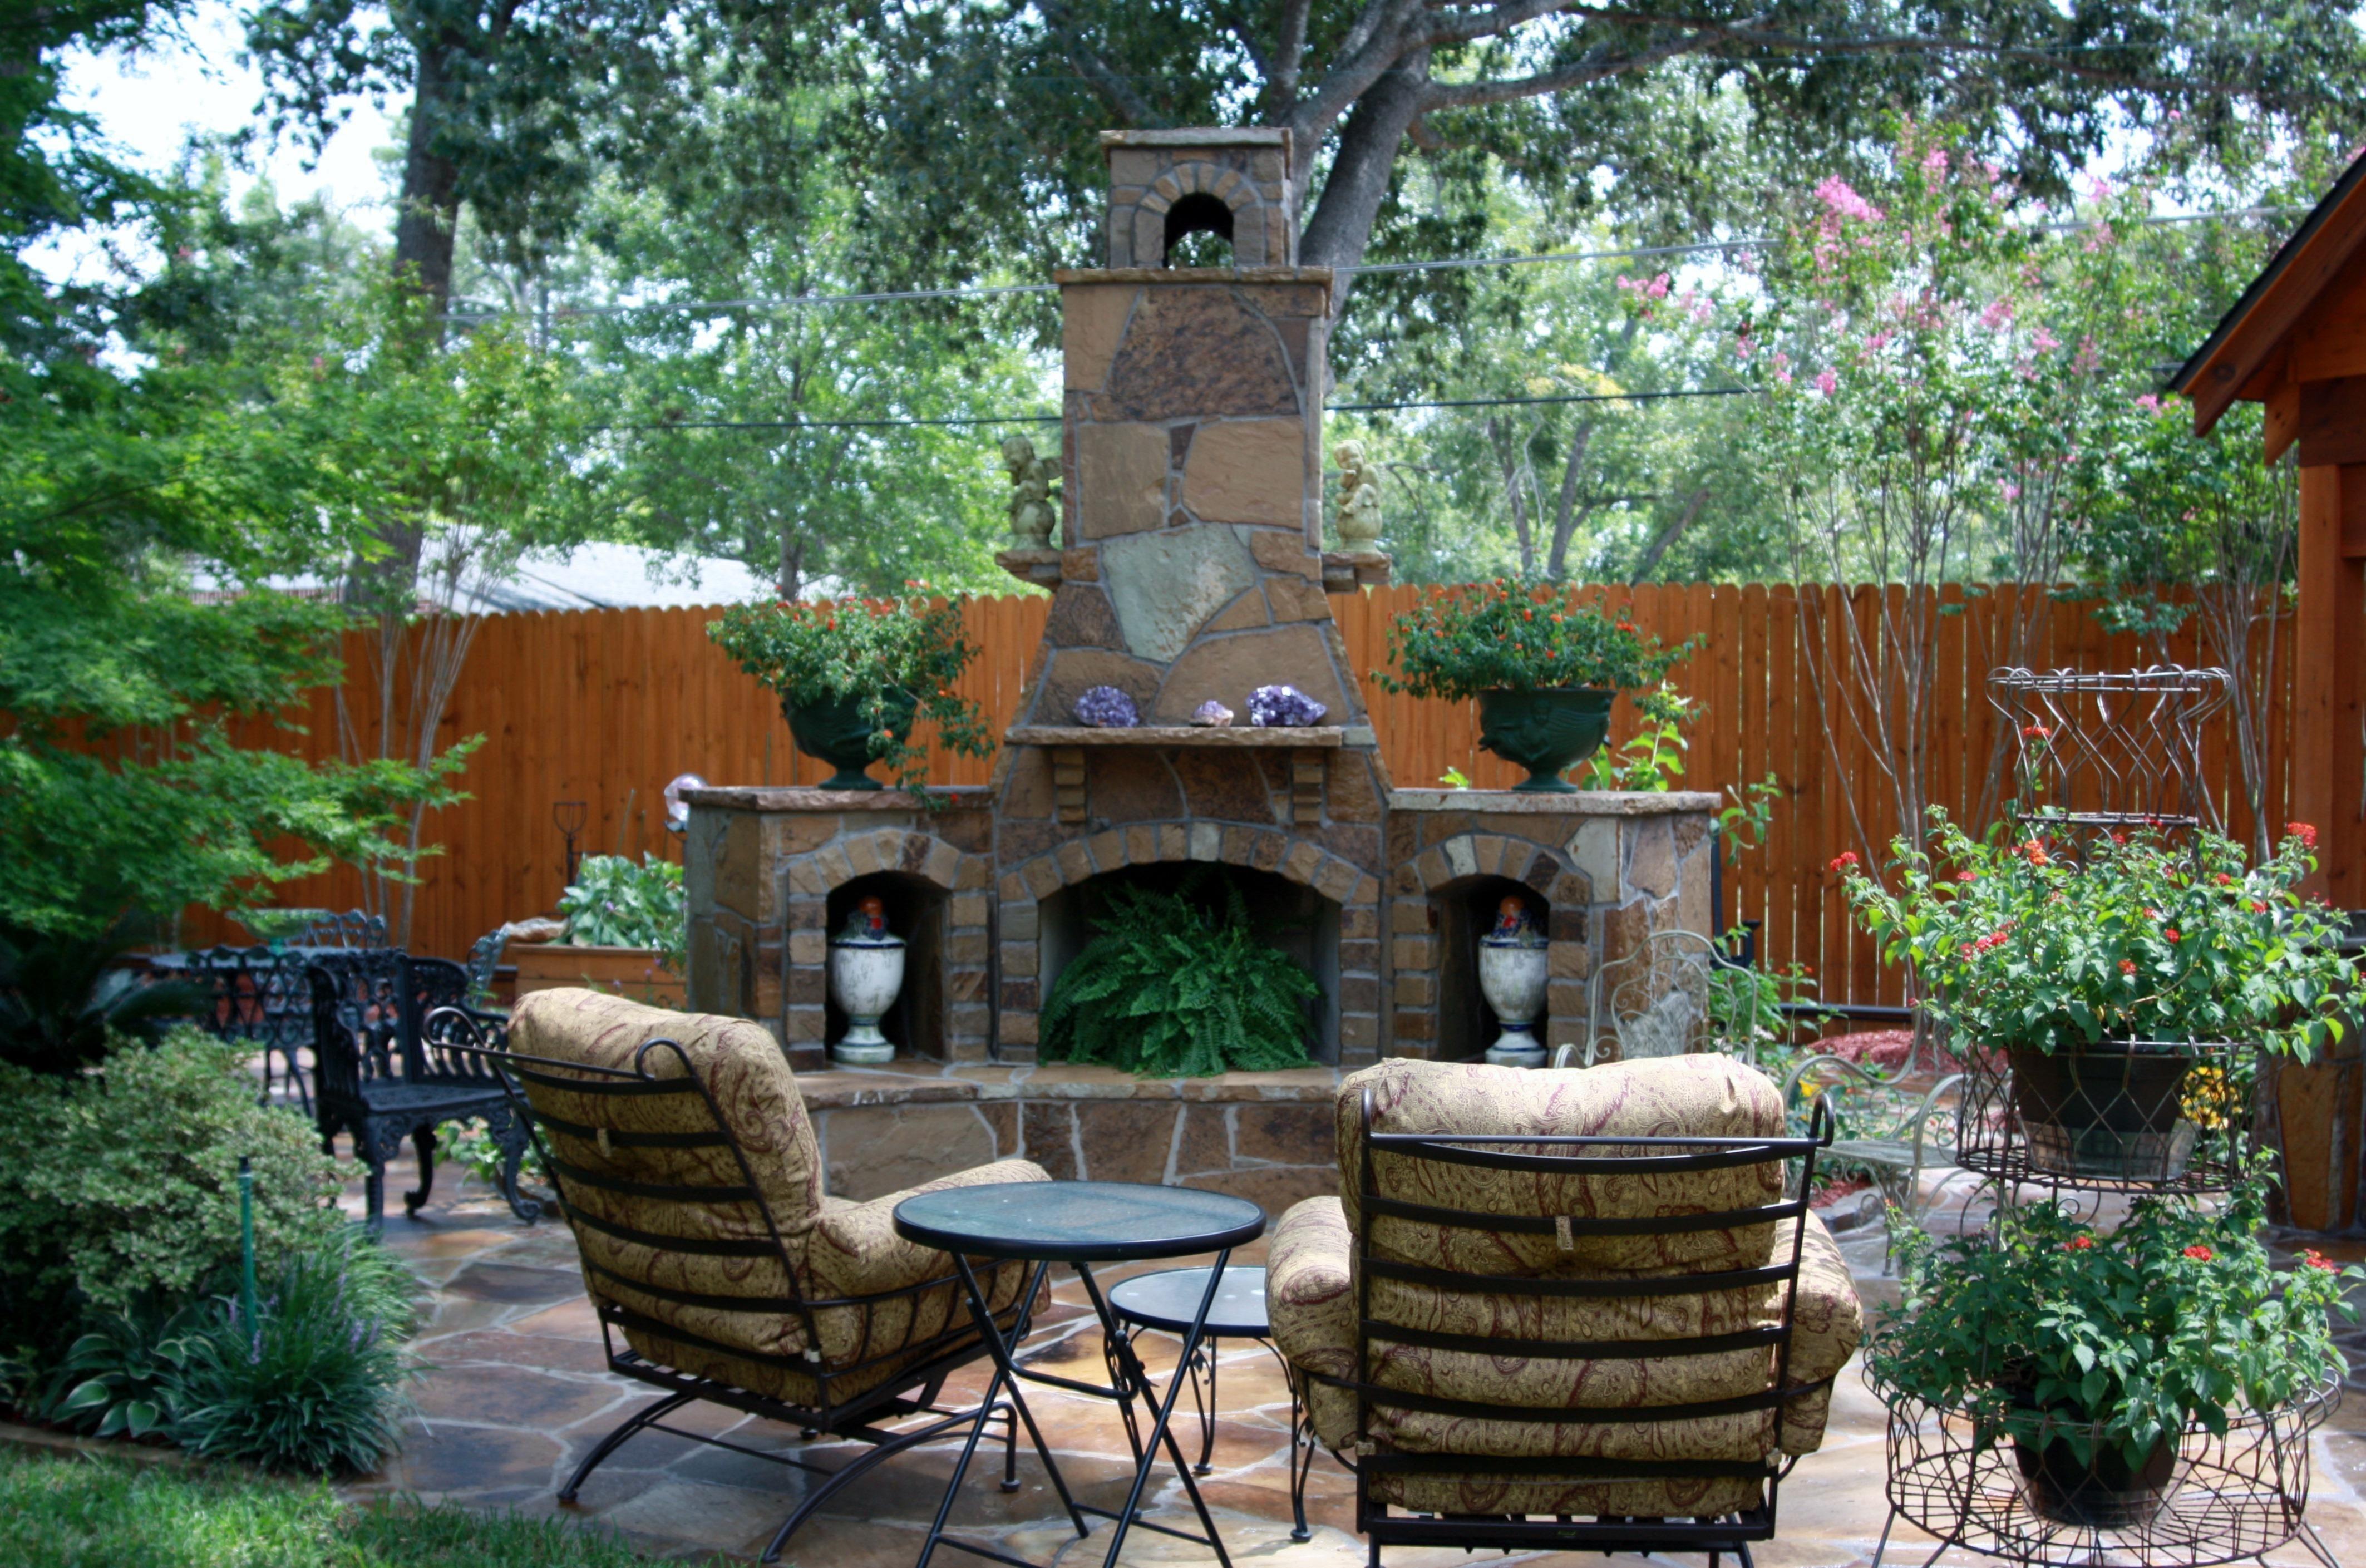 home-decor-outdoor-fireplace-design-ideas-outdoor-for ... on Simple Outdoor Fireplace Ideas id=40269